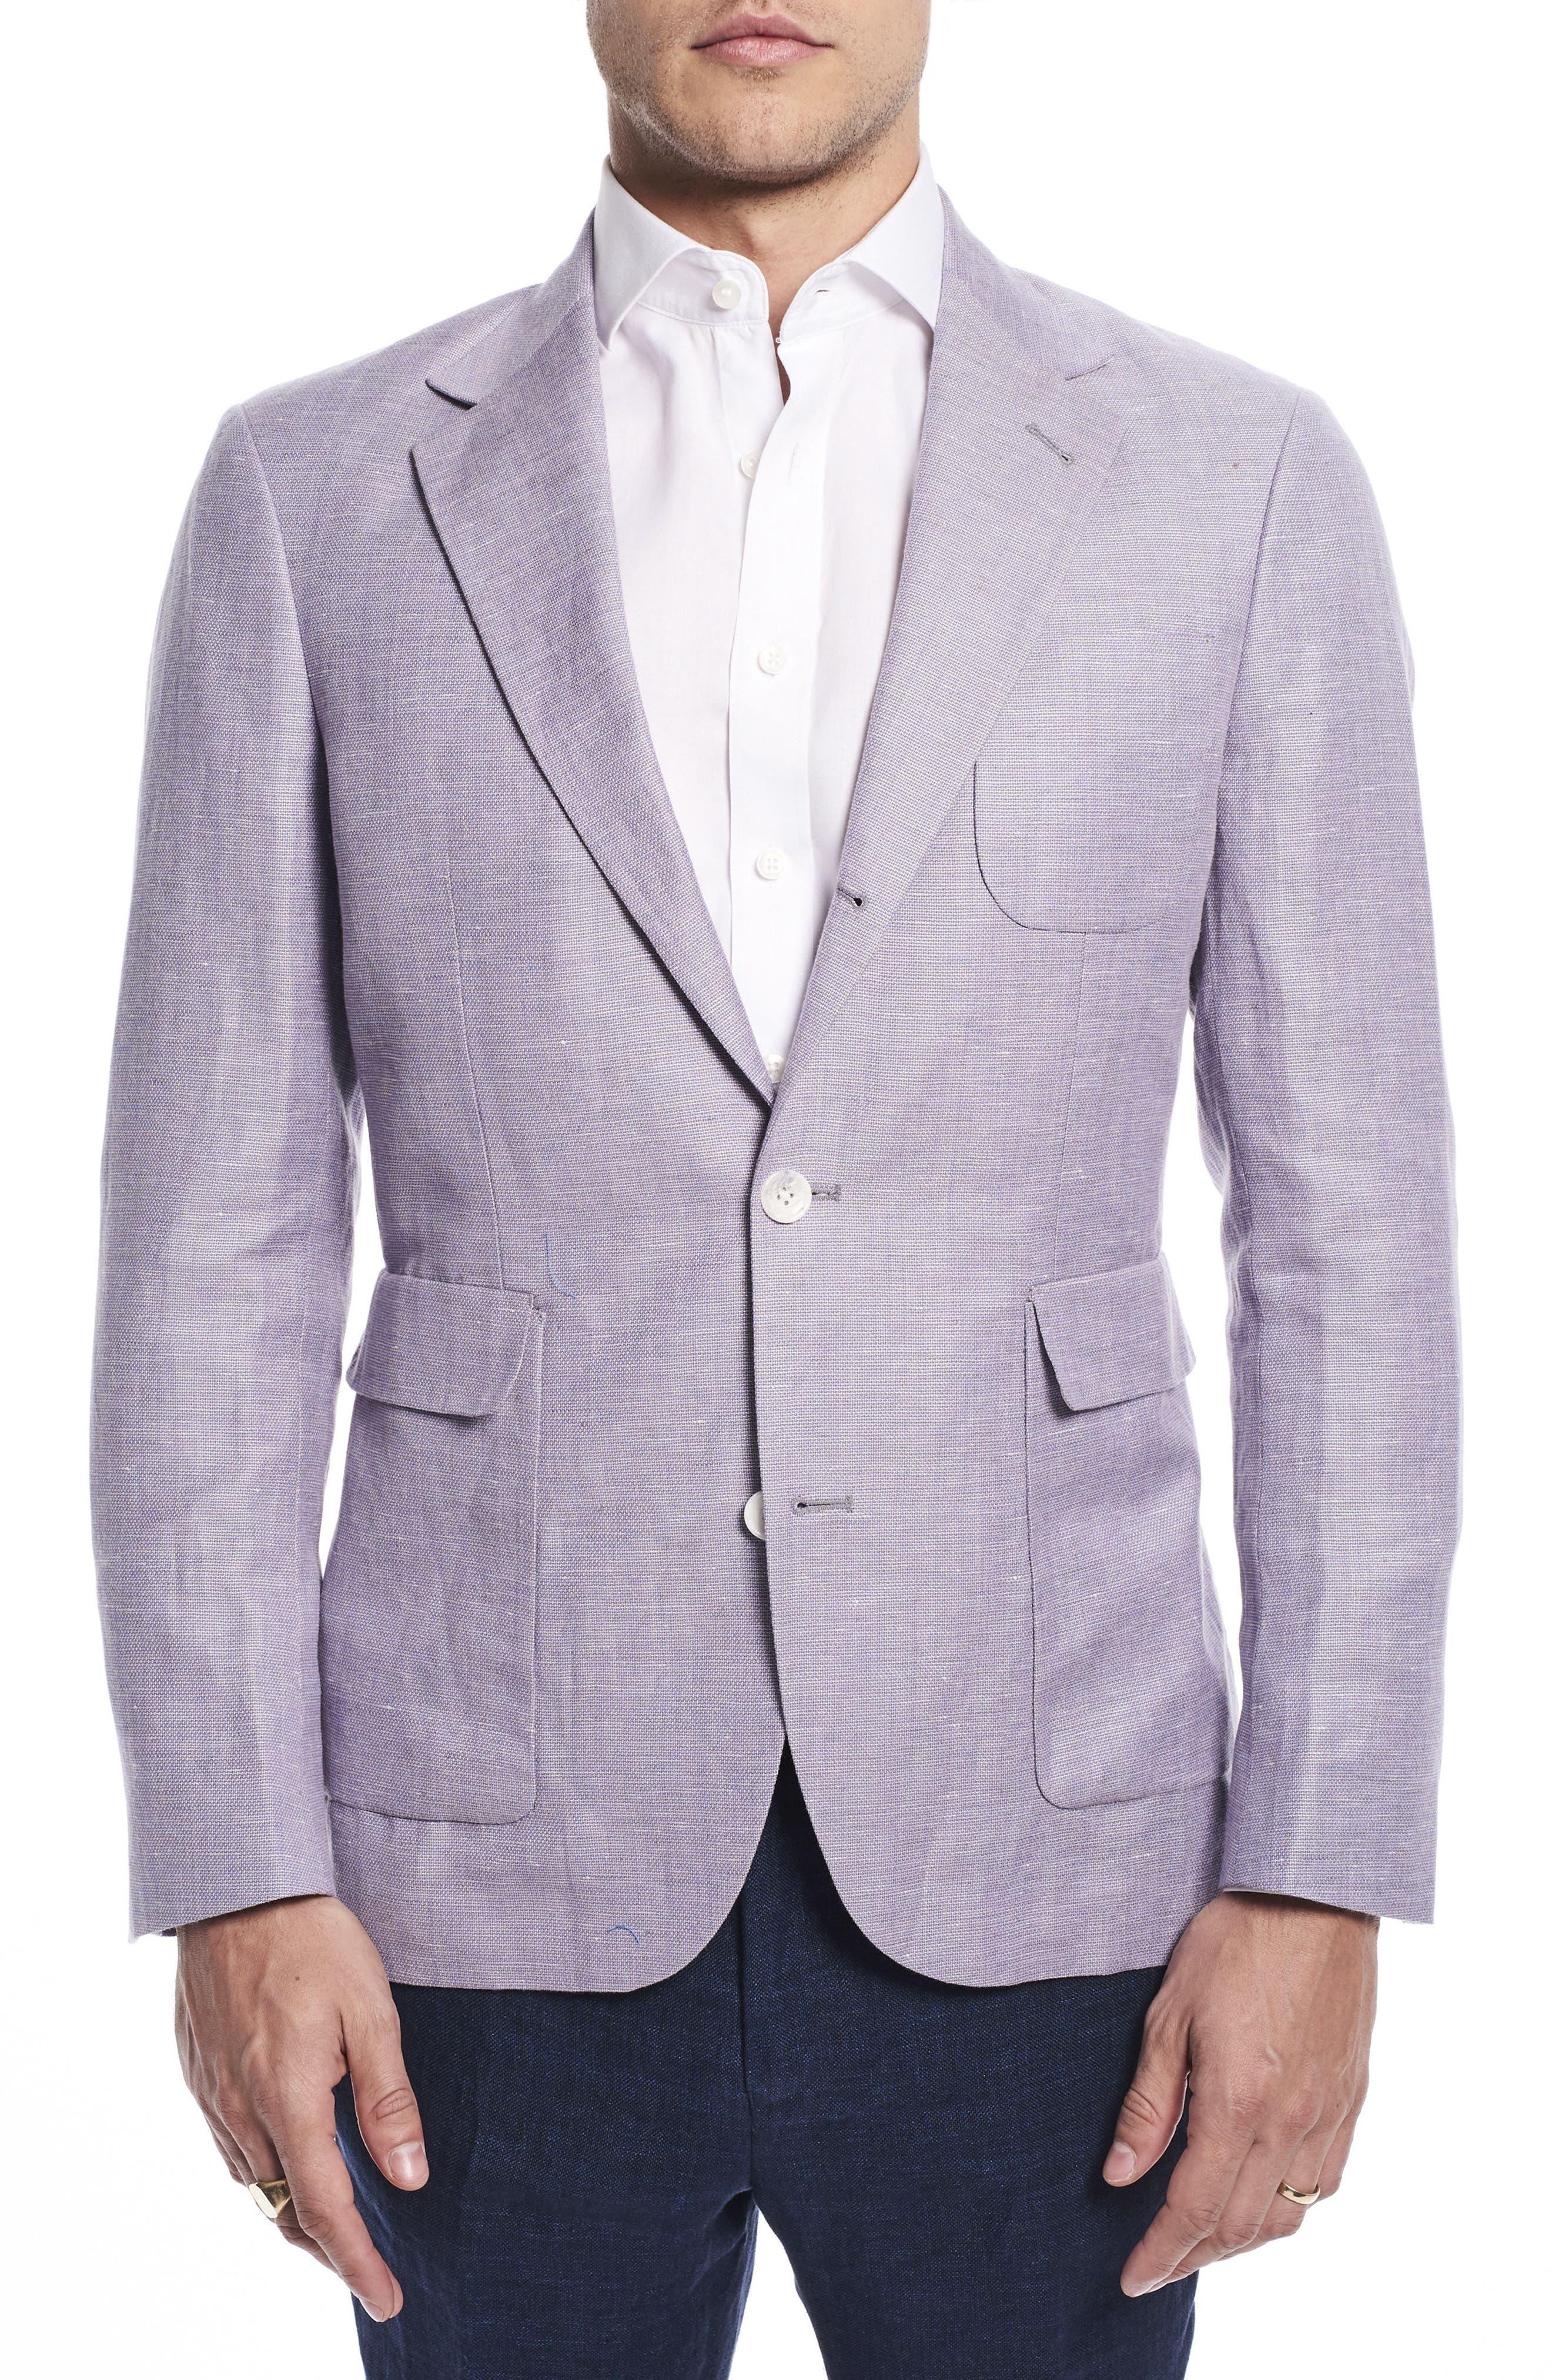 Strong Suit by Ilaria Urbinati Ignatius Slim Fit Linen & Wool Blazer (Nordstrom Exclusive)